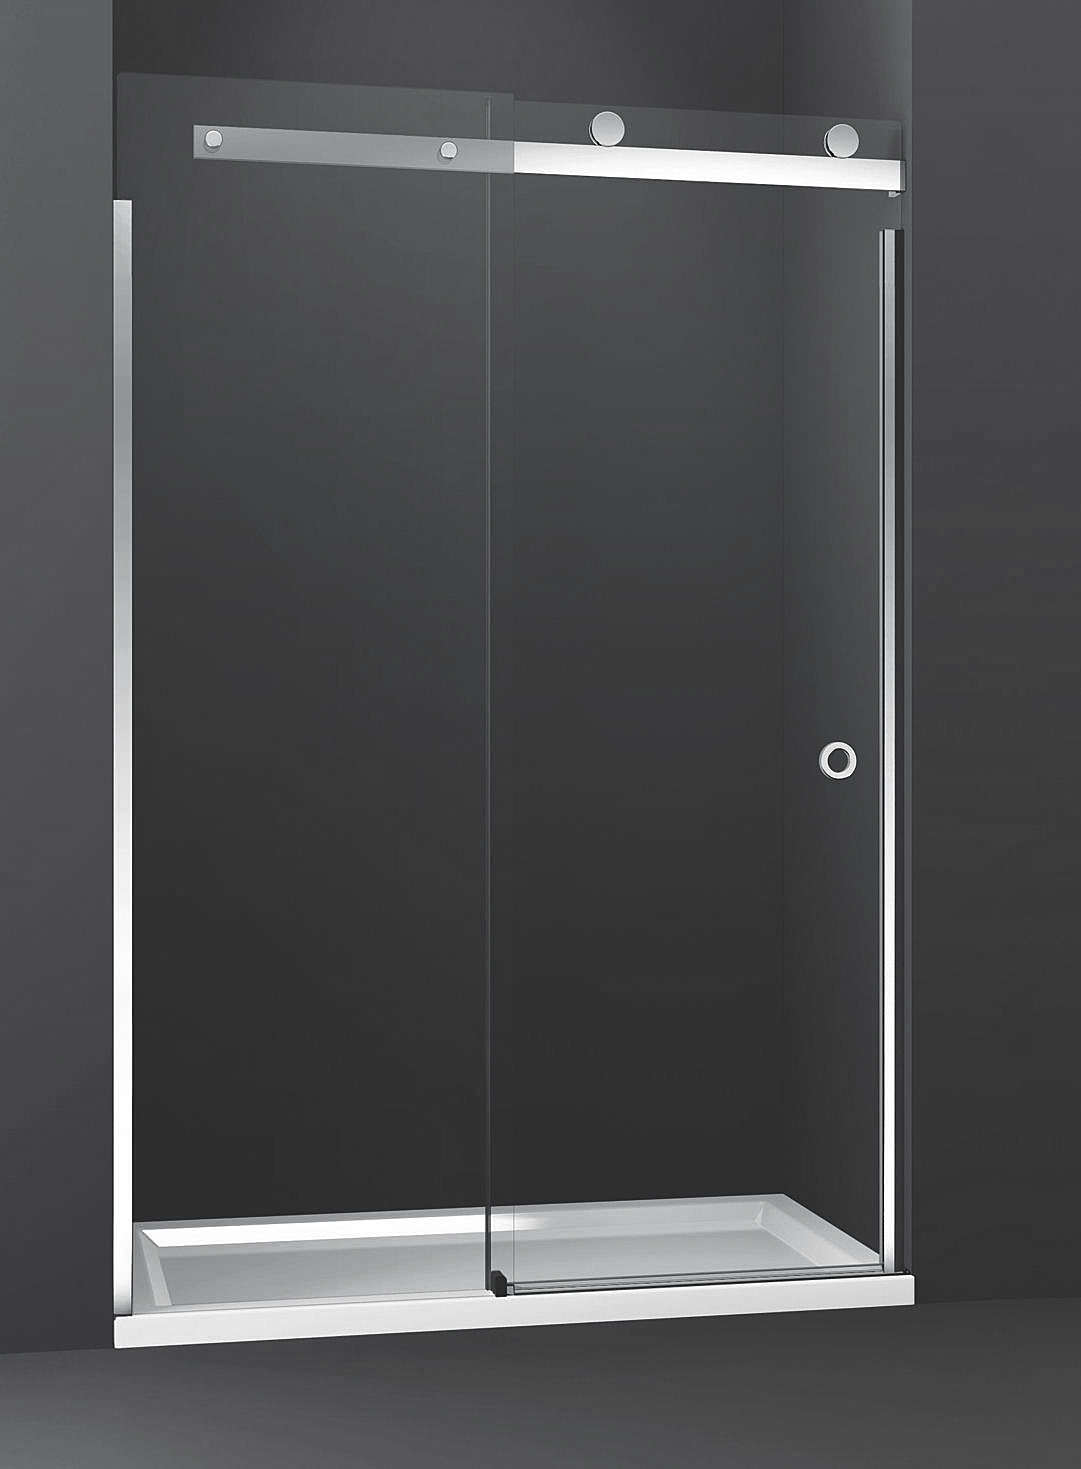 Merlyn 10 Series Sliding Shower Door 1000mm